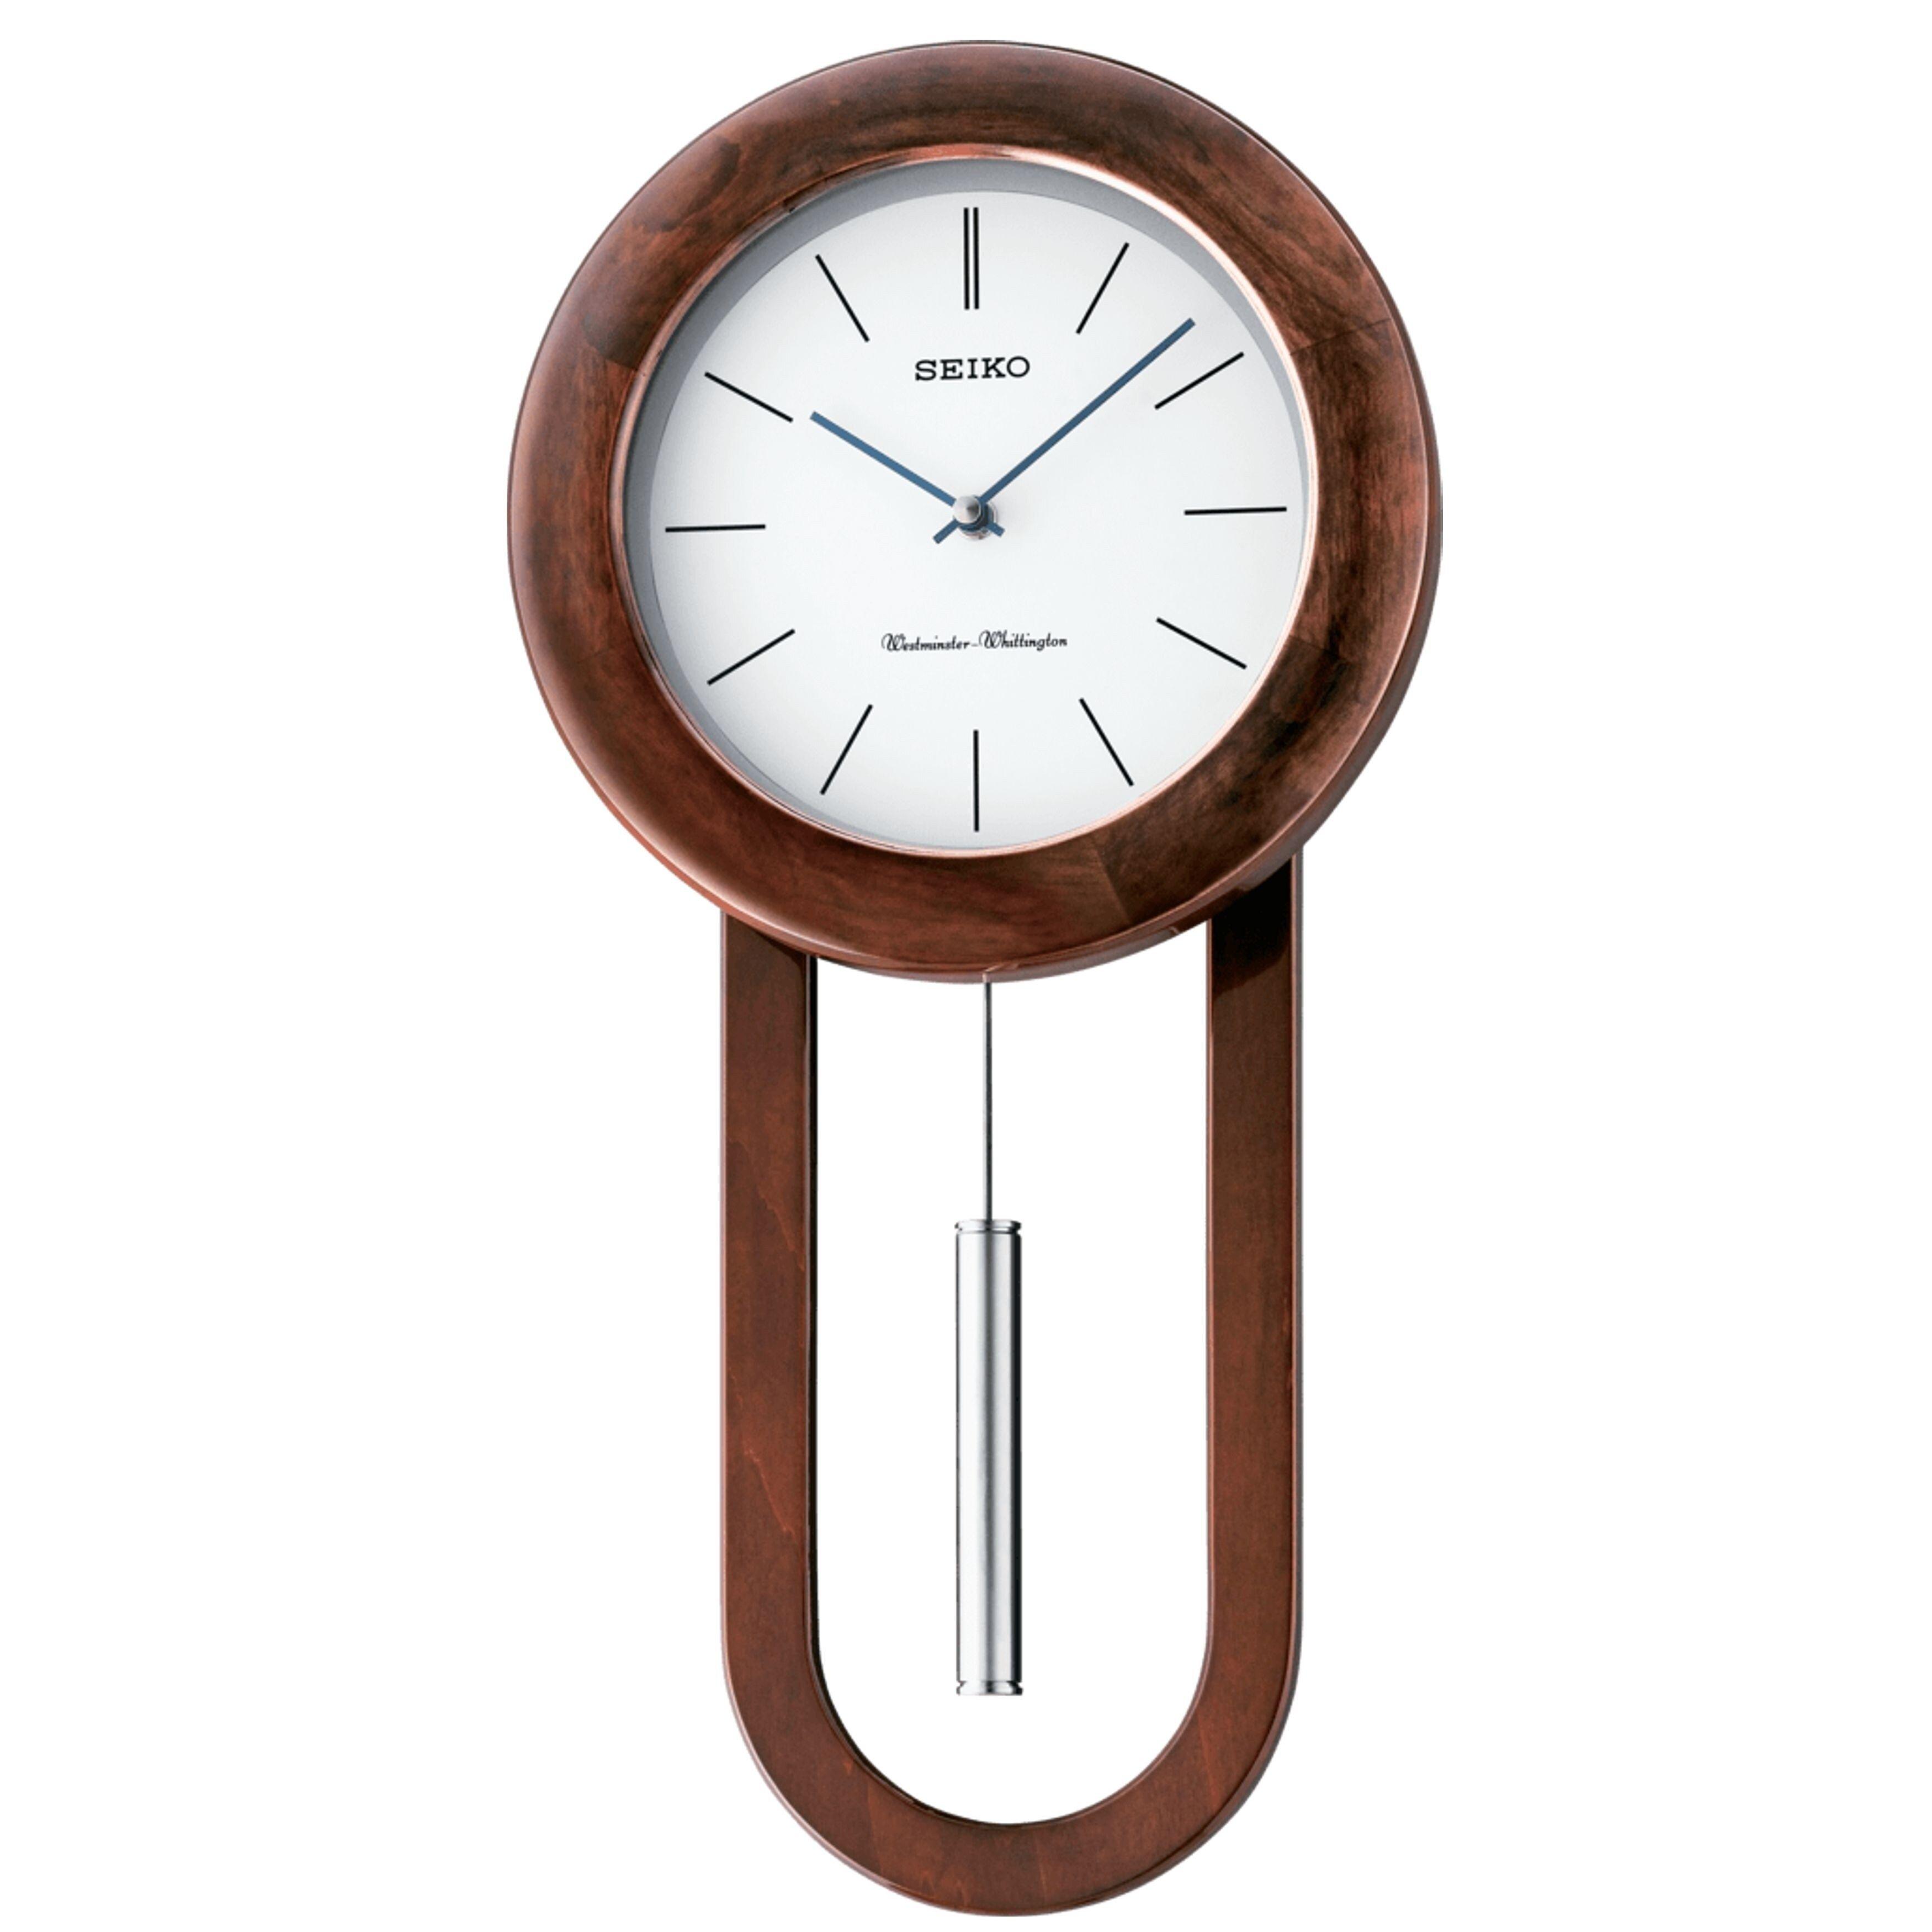 Seiko Circular Sleek Wall Clock With Pendulum And Dual Chimes Chiming Brown Wood Pendulum Wall Clock Clock Wall Clock Wooden